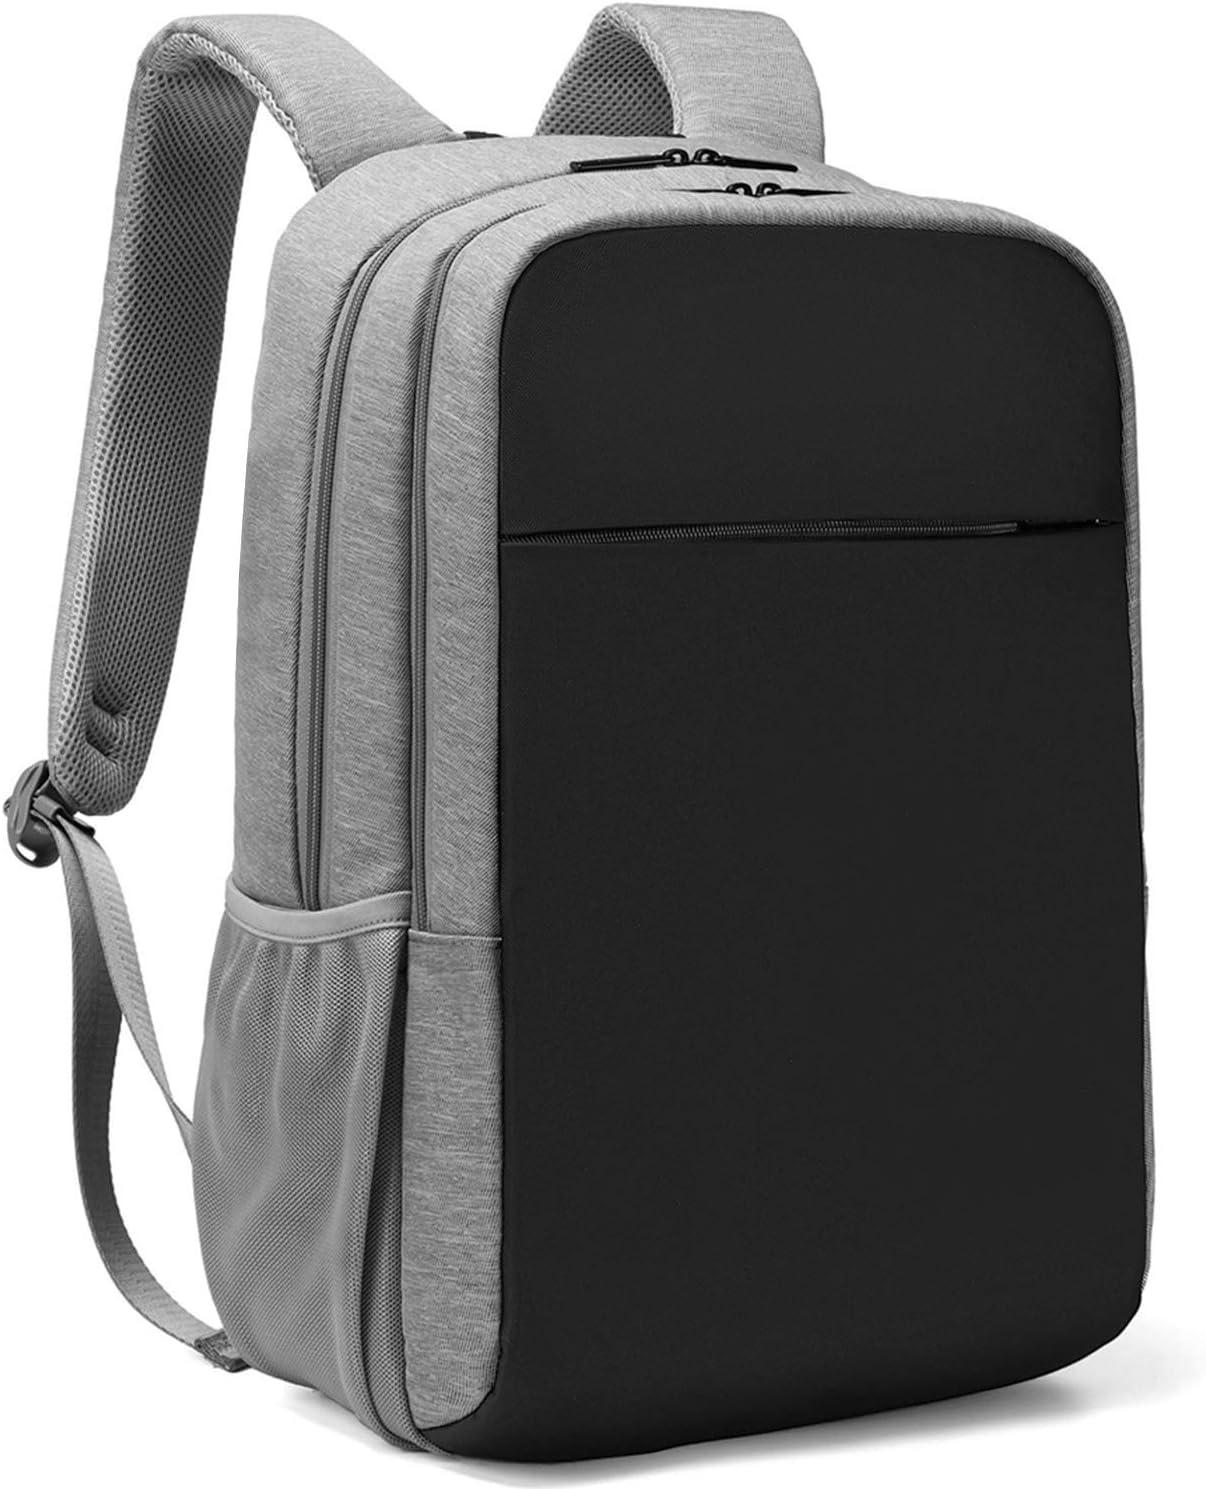 Oscaurt Travel Laptop Backpack, Business High School College Bookbag,Slim Daypack for Women & Men Fit 15.6 Inches Laptop